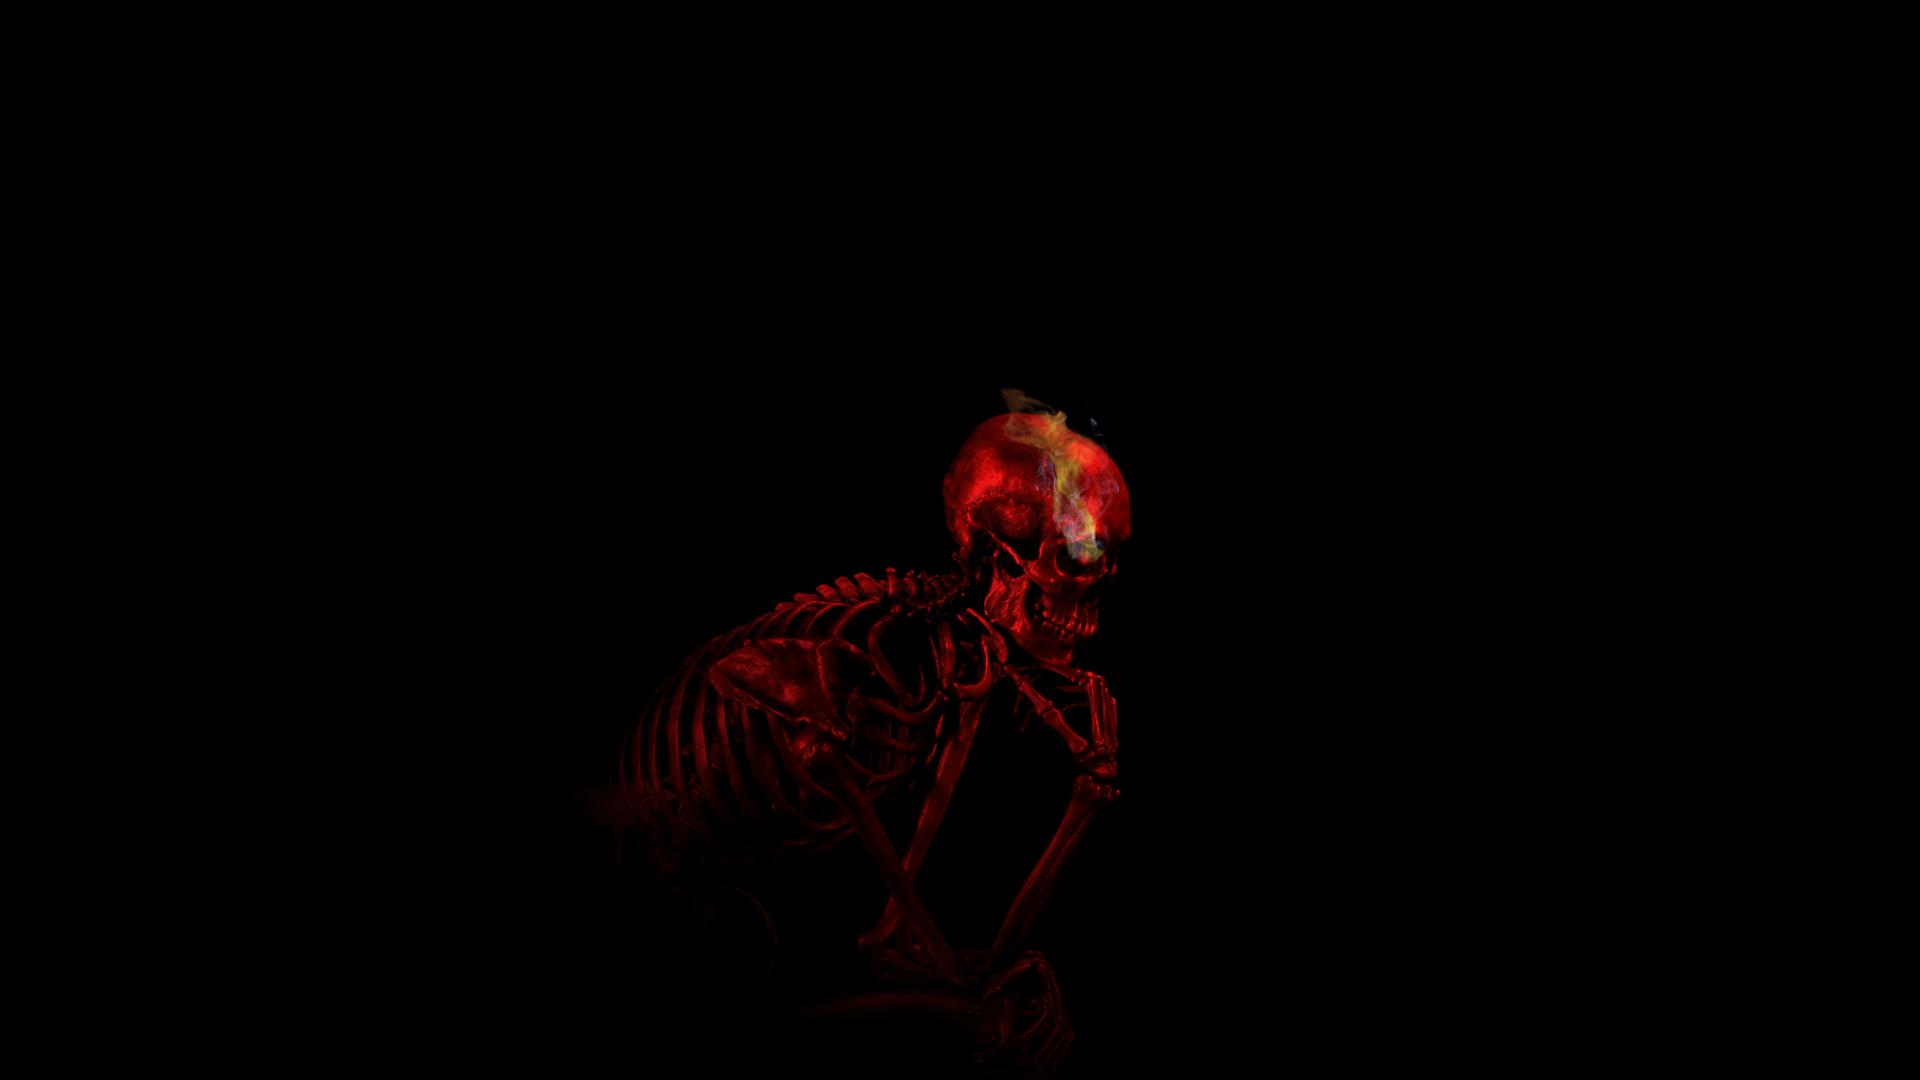 Digital Art Black Background Minimalism Red Smoke Bones Skull Teeth Imagination Skeleton Thinking Ribs Auguste Rodin